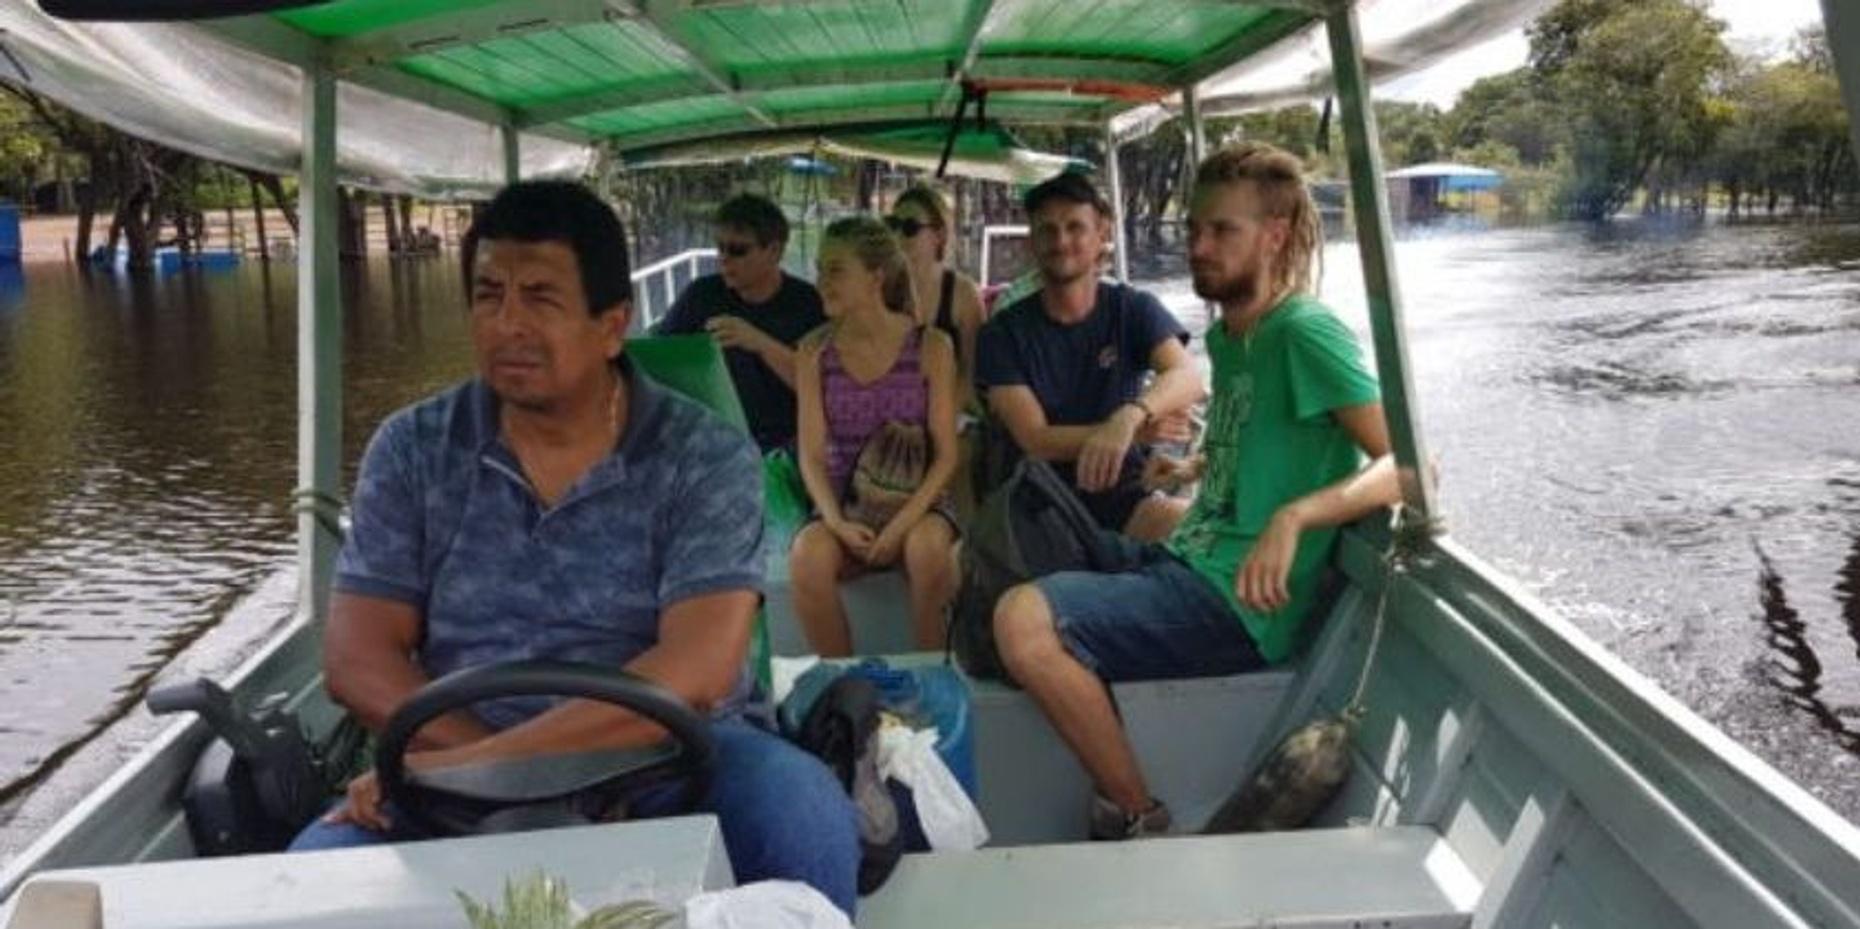 3-Day, 2-Night Adventure in the Amazon Rainforest